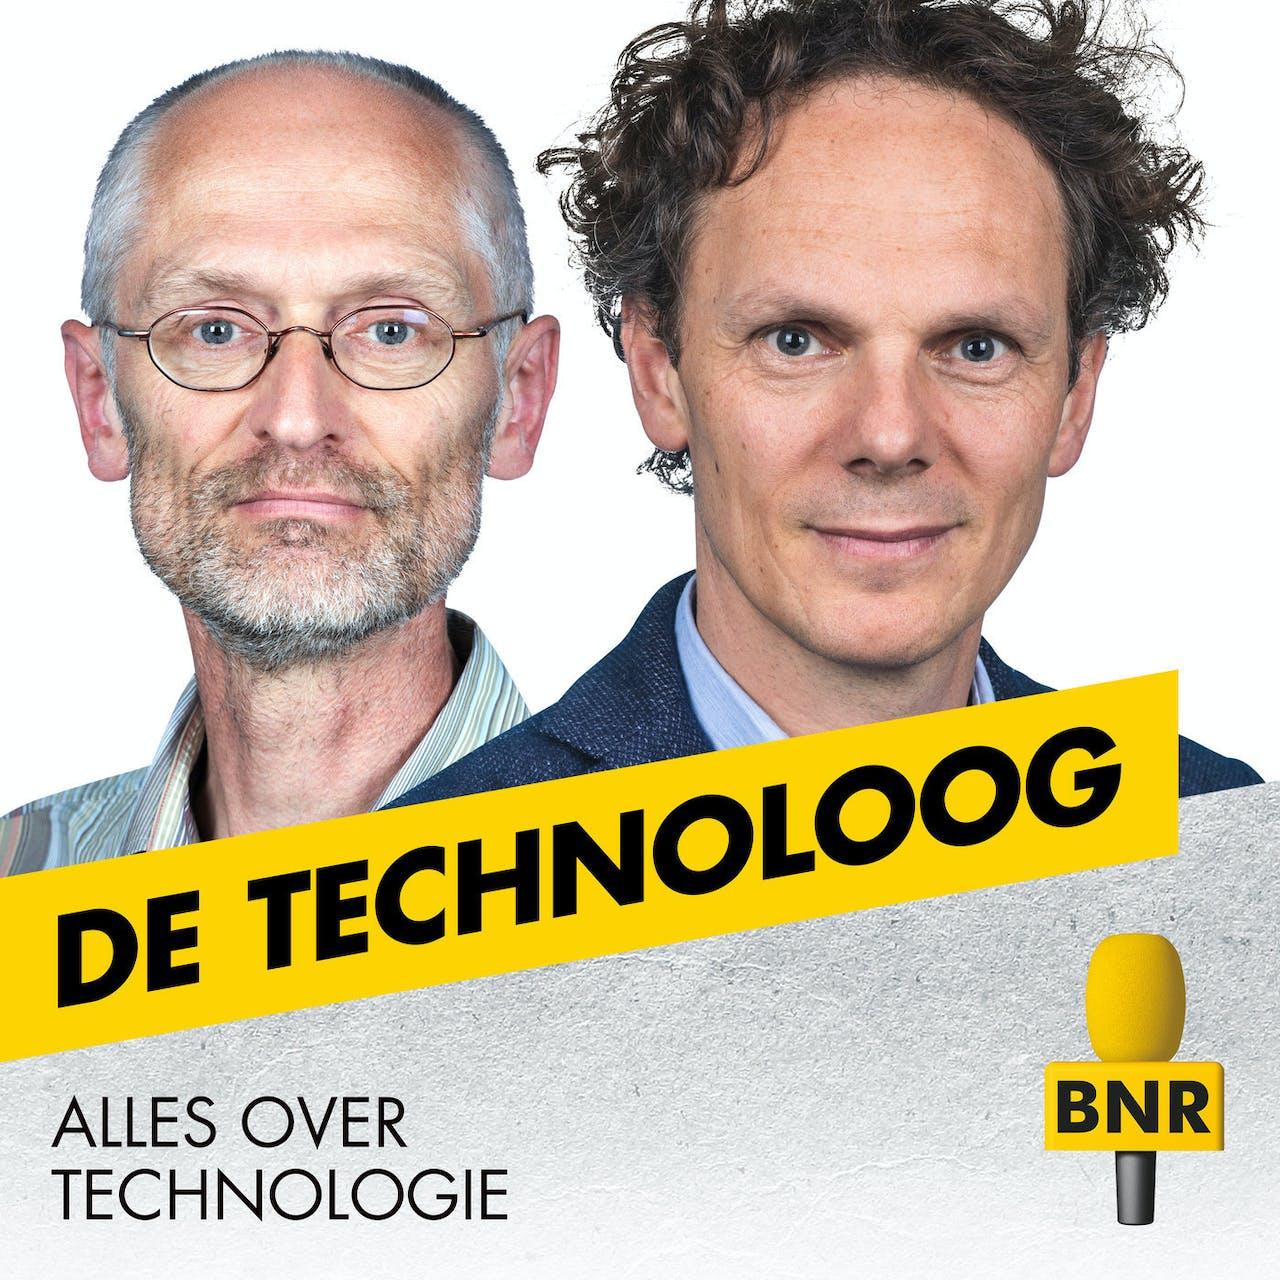 BNR radio vormgeving voor de losse programma's de technoloog